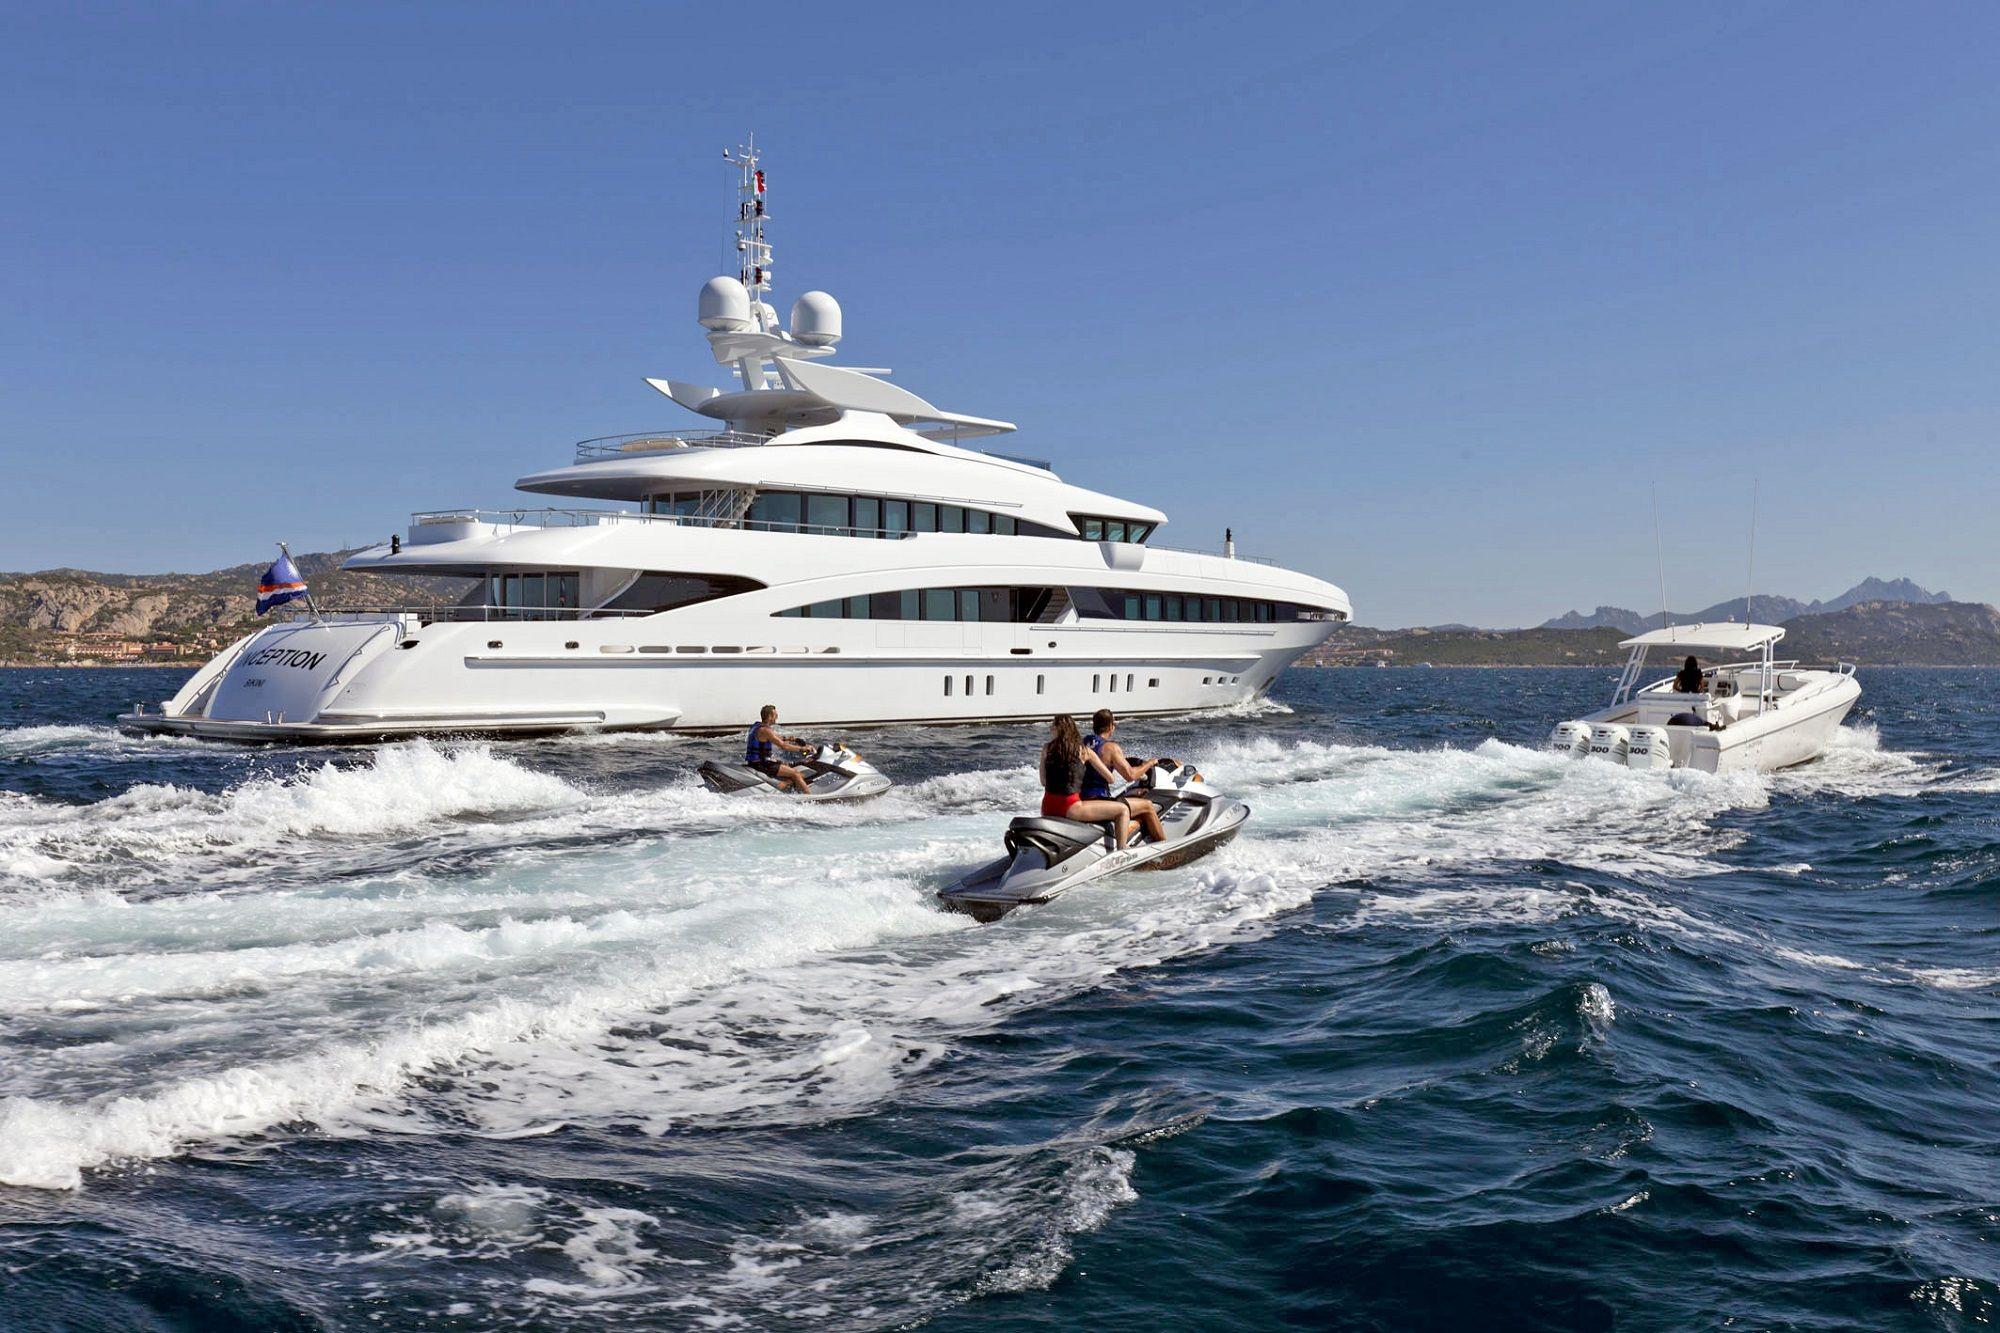 heesen yachts, inception, yacht charter